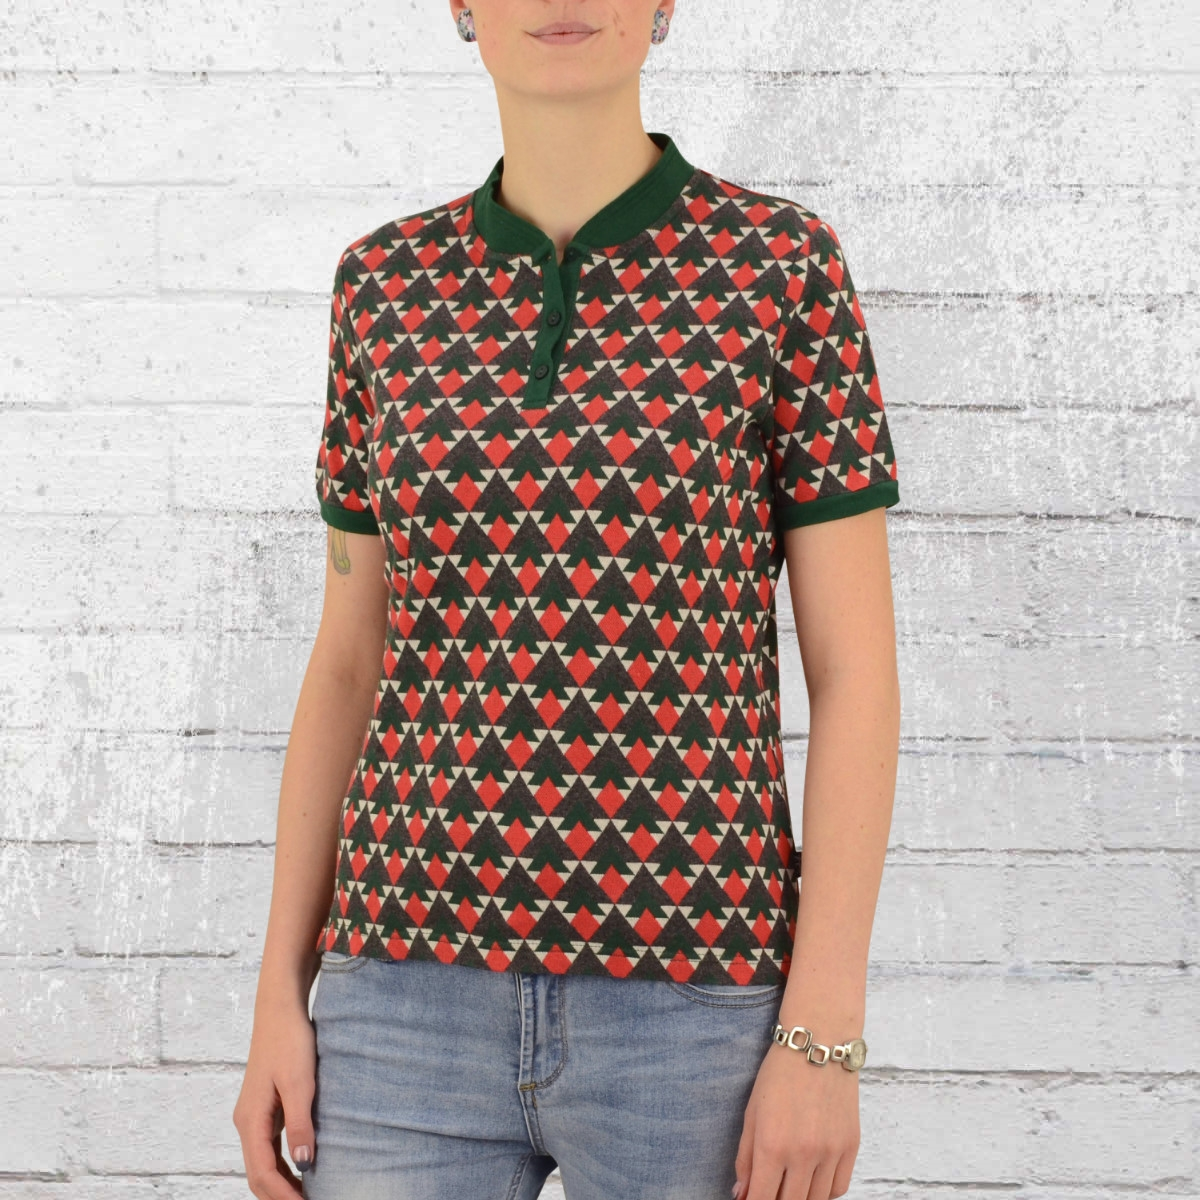 Ato Berlin Damen Polo Shirt Jette bunt